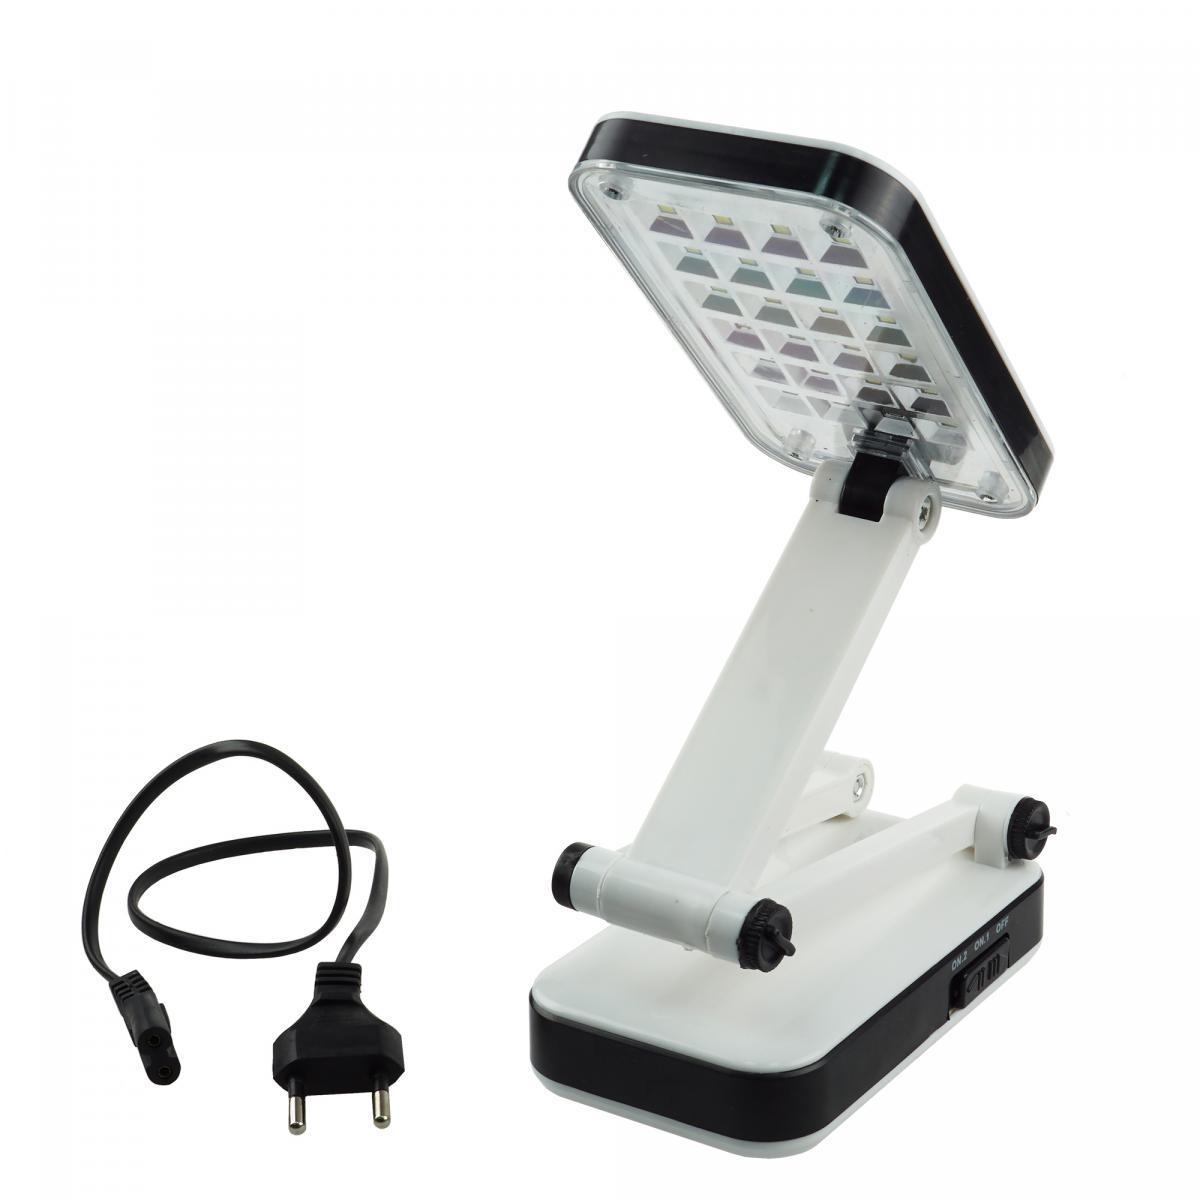 Настольная лампа трансформер 24 LED с аккумулятором - фото 2